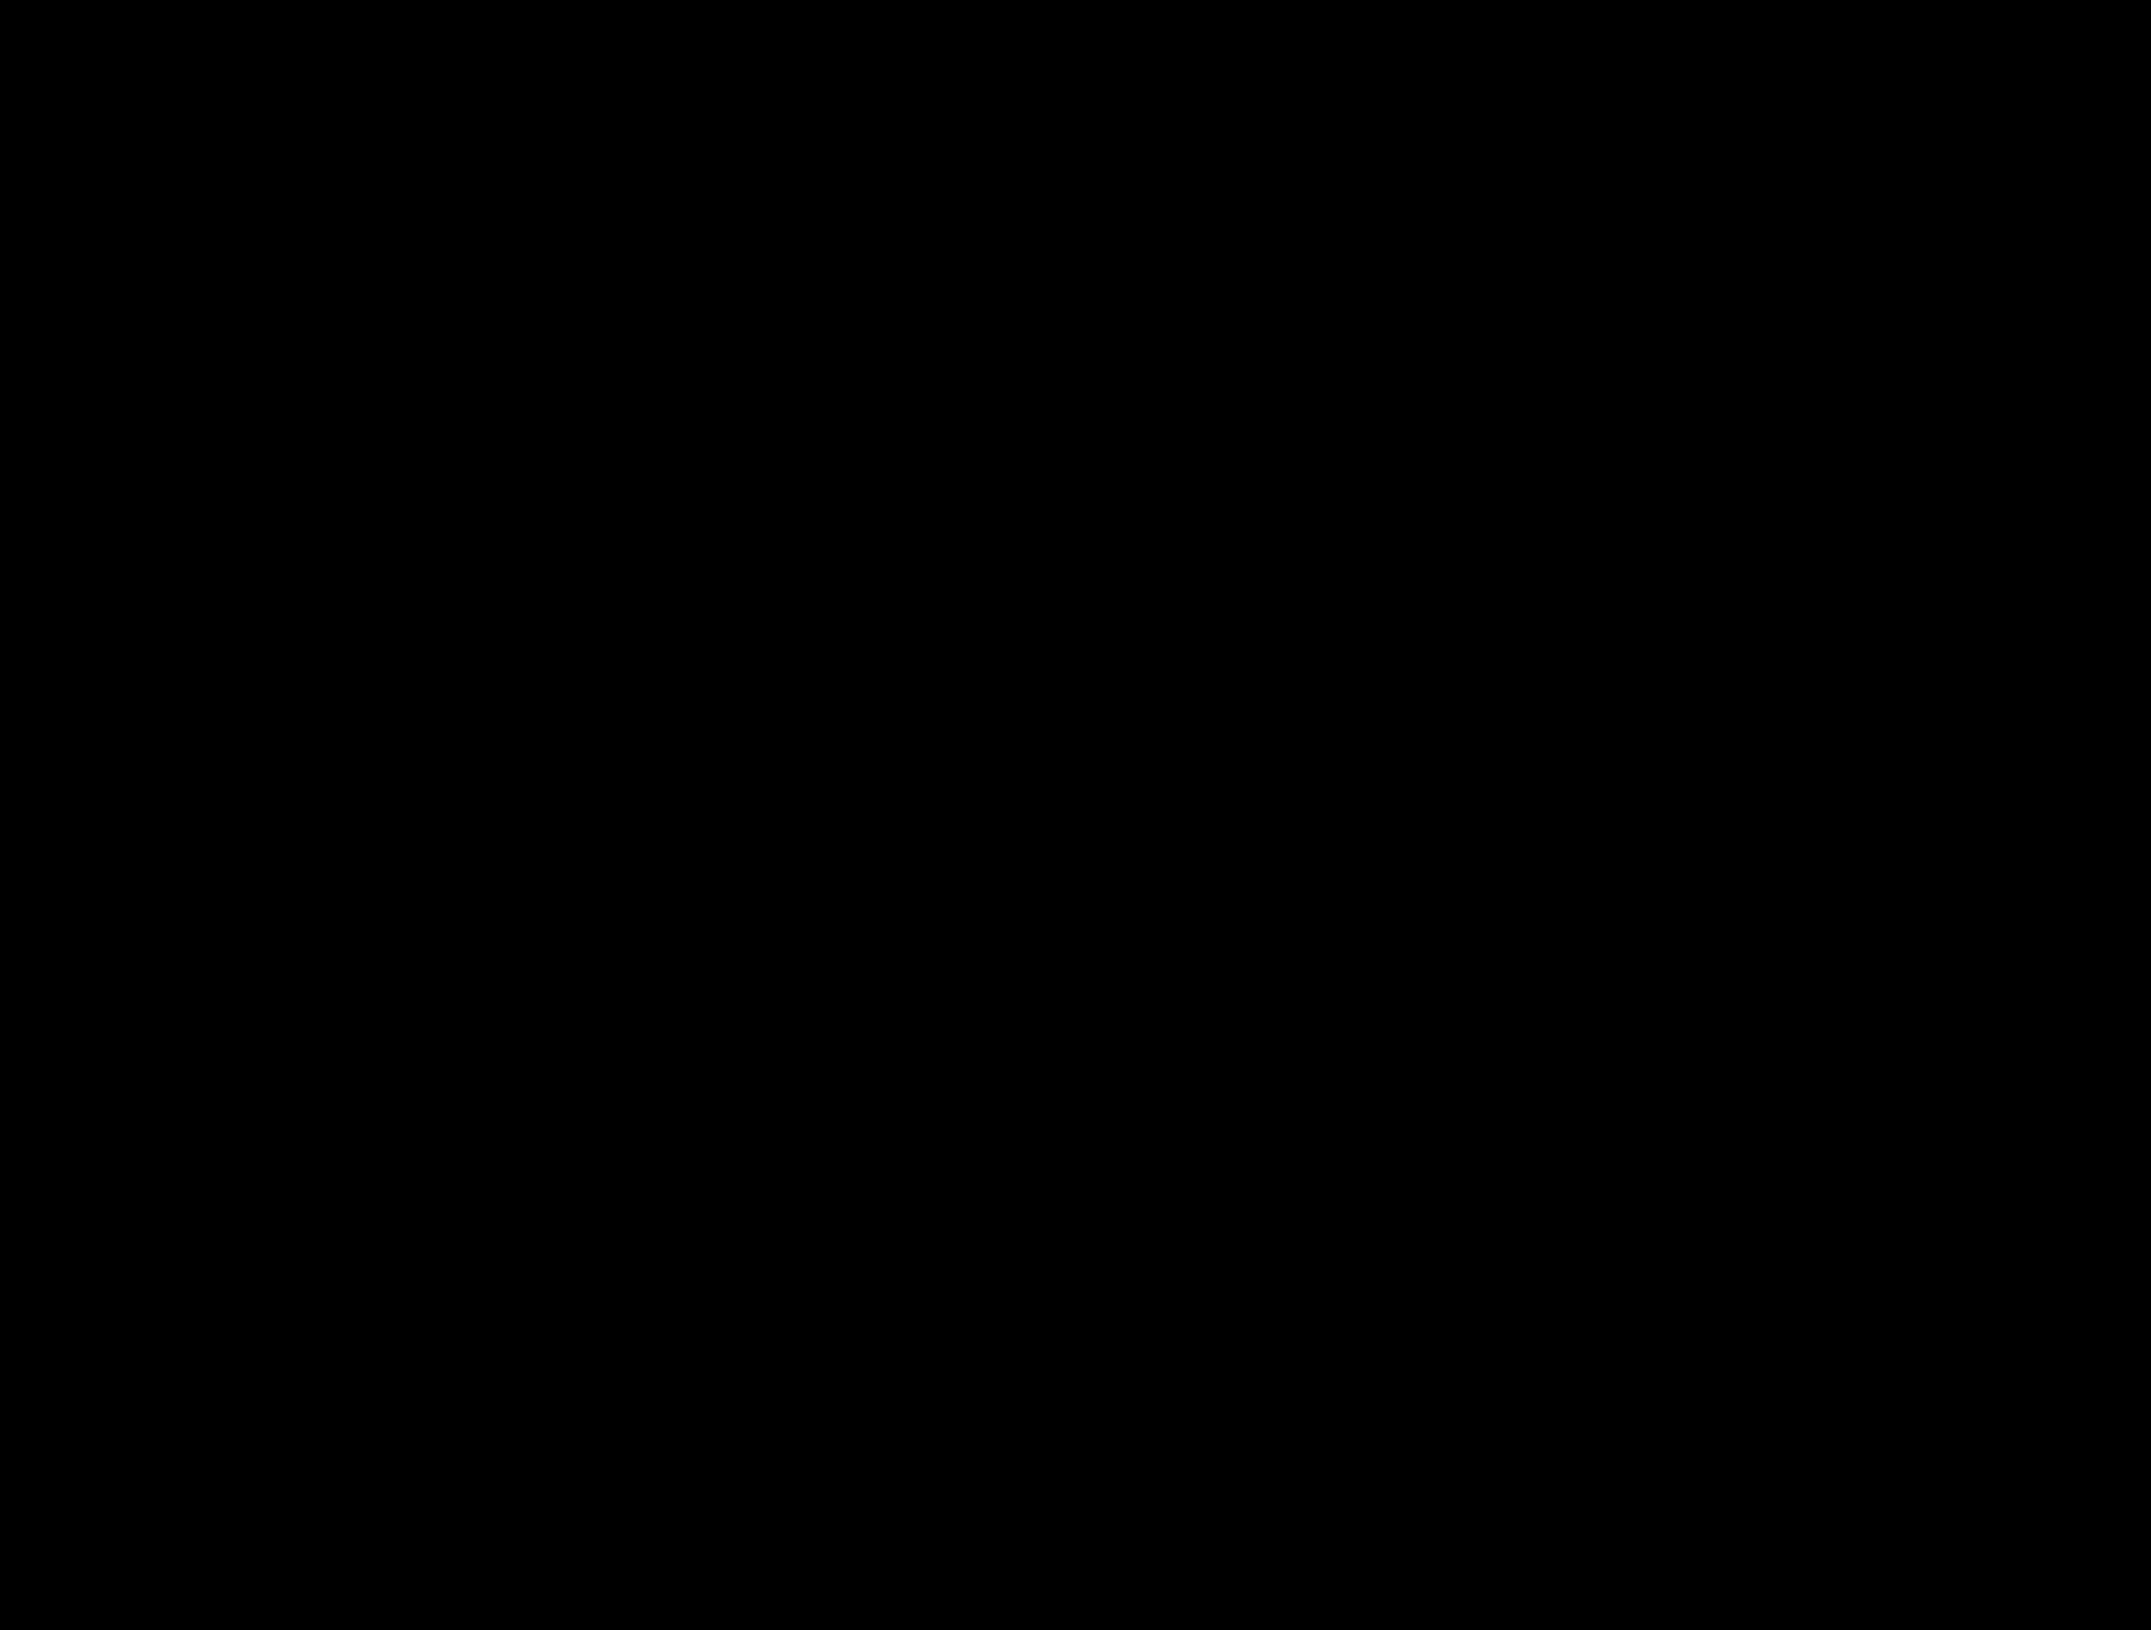 2151x1630 Clipart